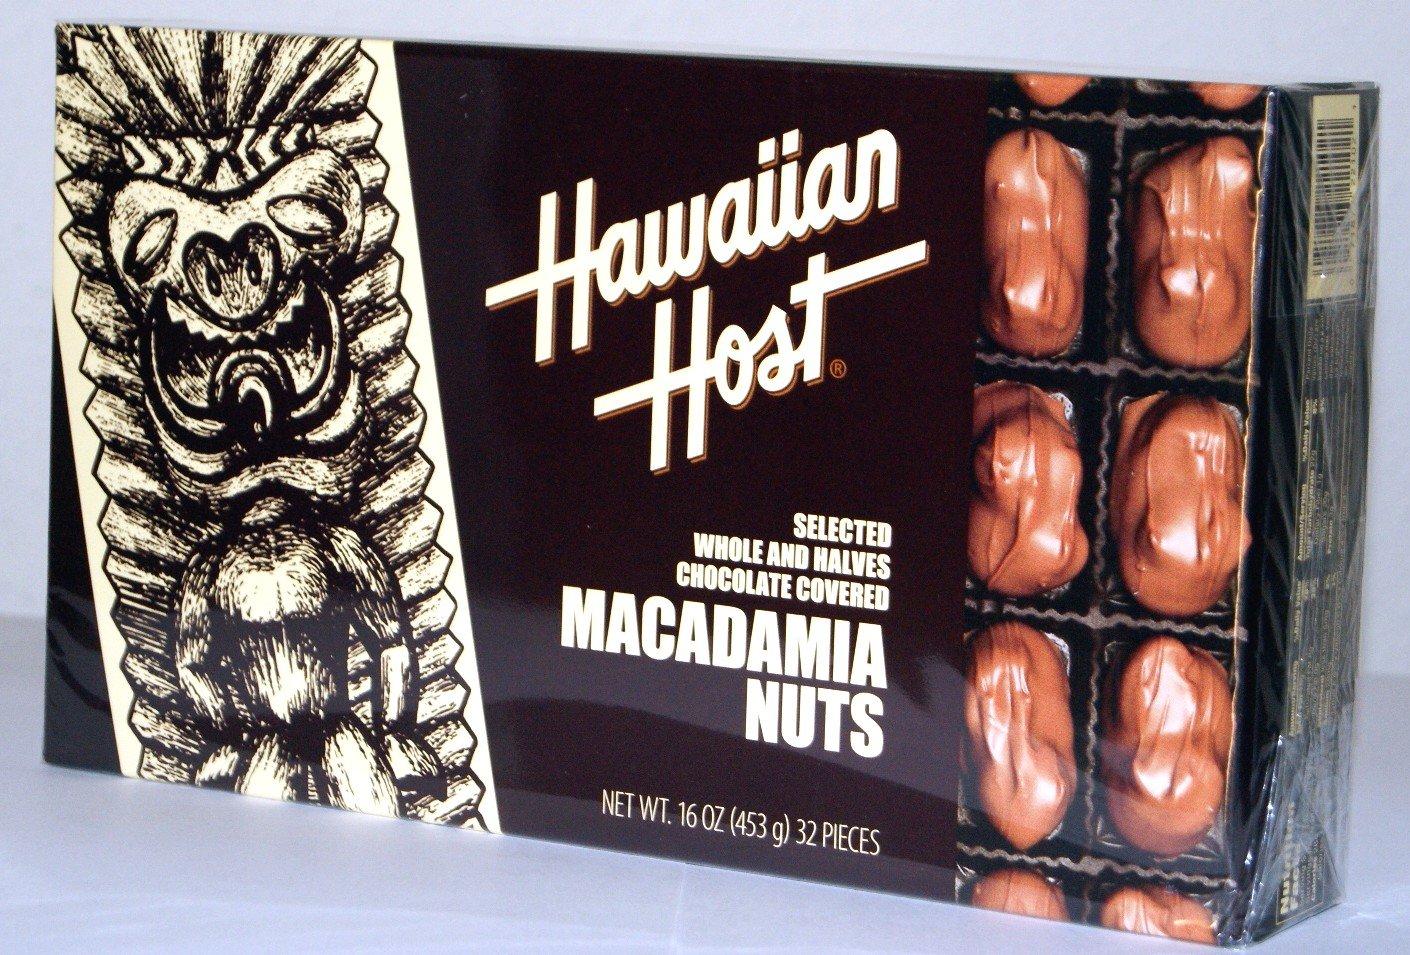 Amazon.com : Hawaiian Host SELECTED WHOLE AND HALVES CHOCOLATE ...